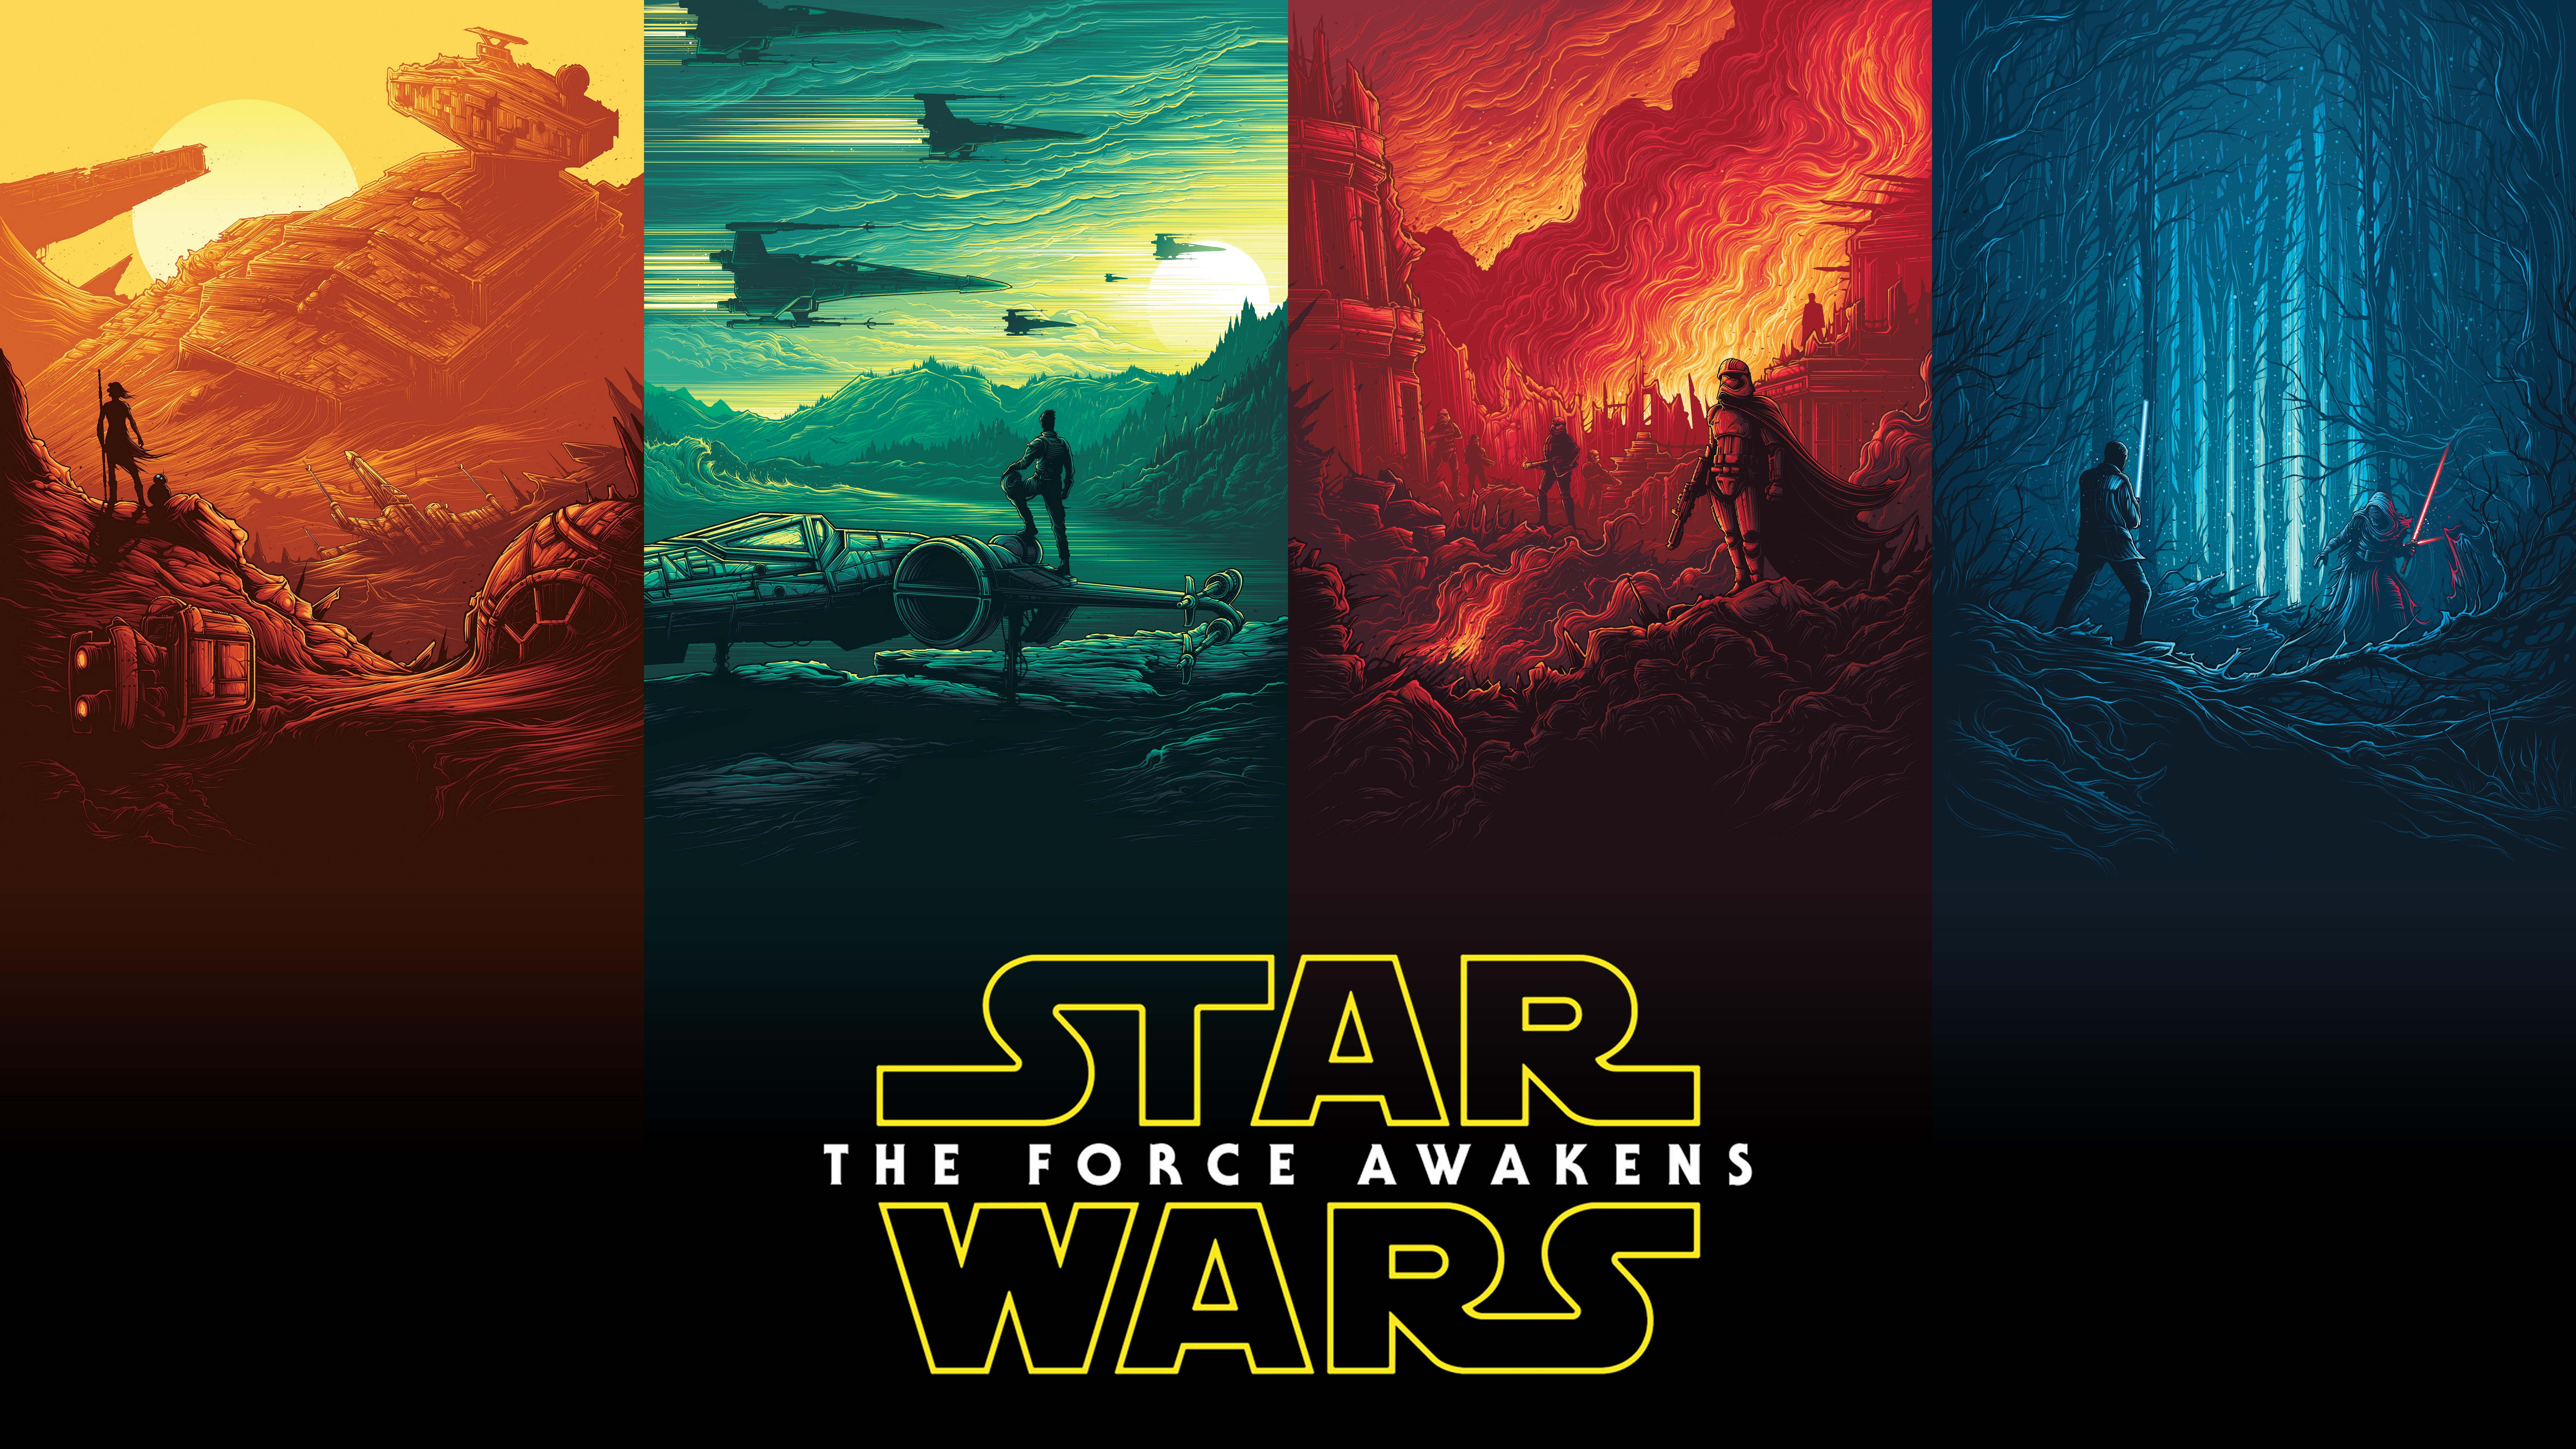 Force Awakens Imax Wallpaper By Dan Mumford By Valmont1702 On Deviantart